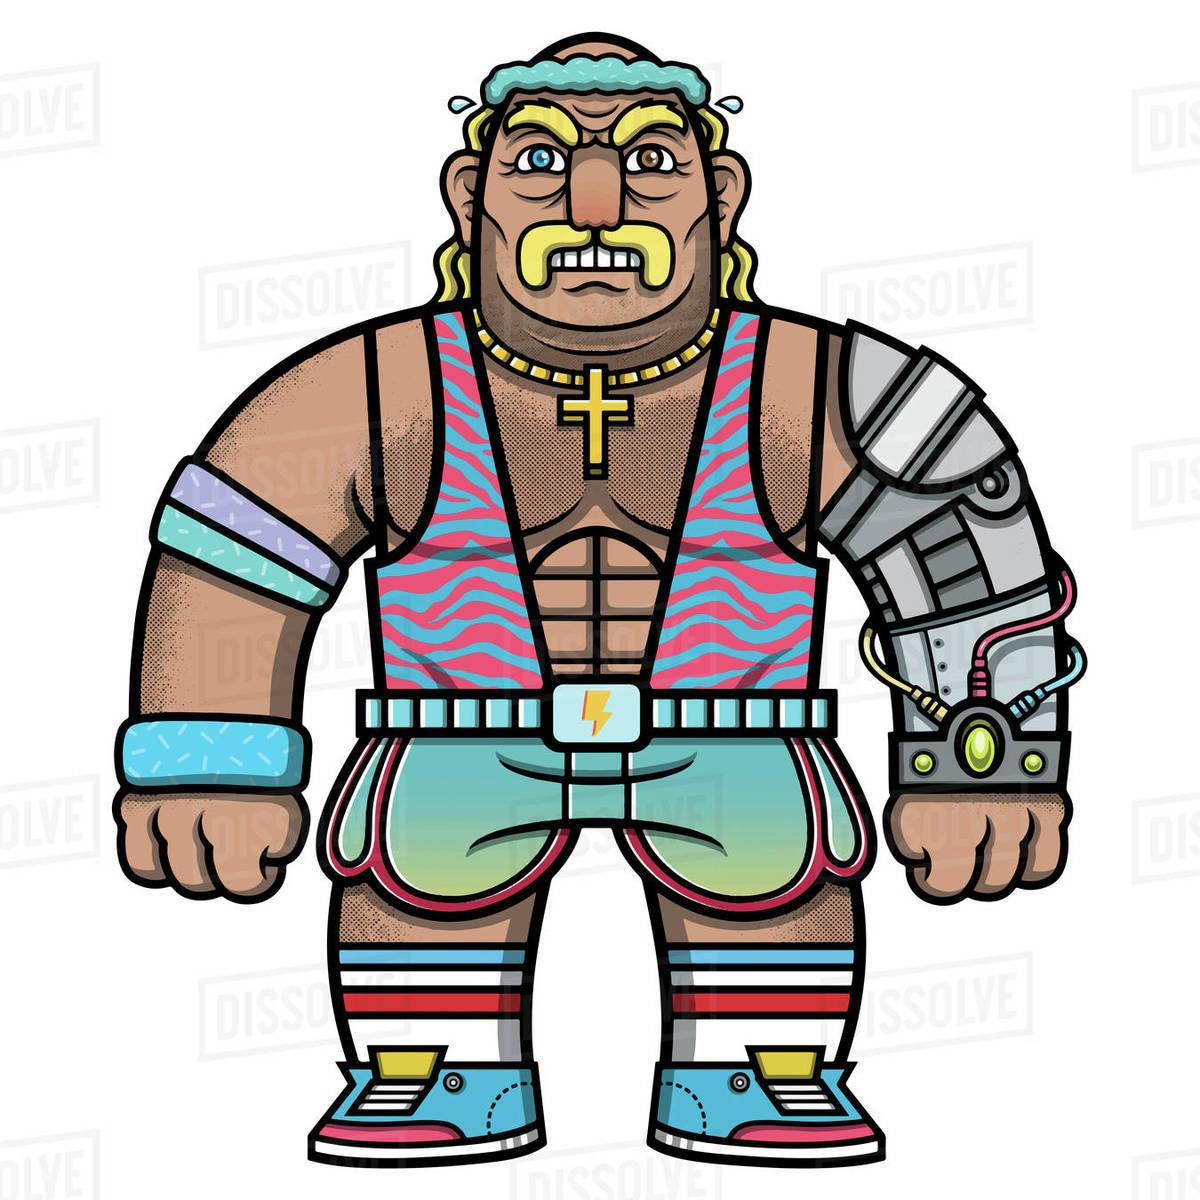 Cartoon illustration of wrestler against white background Royalty-free stock photo